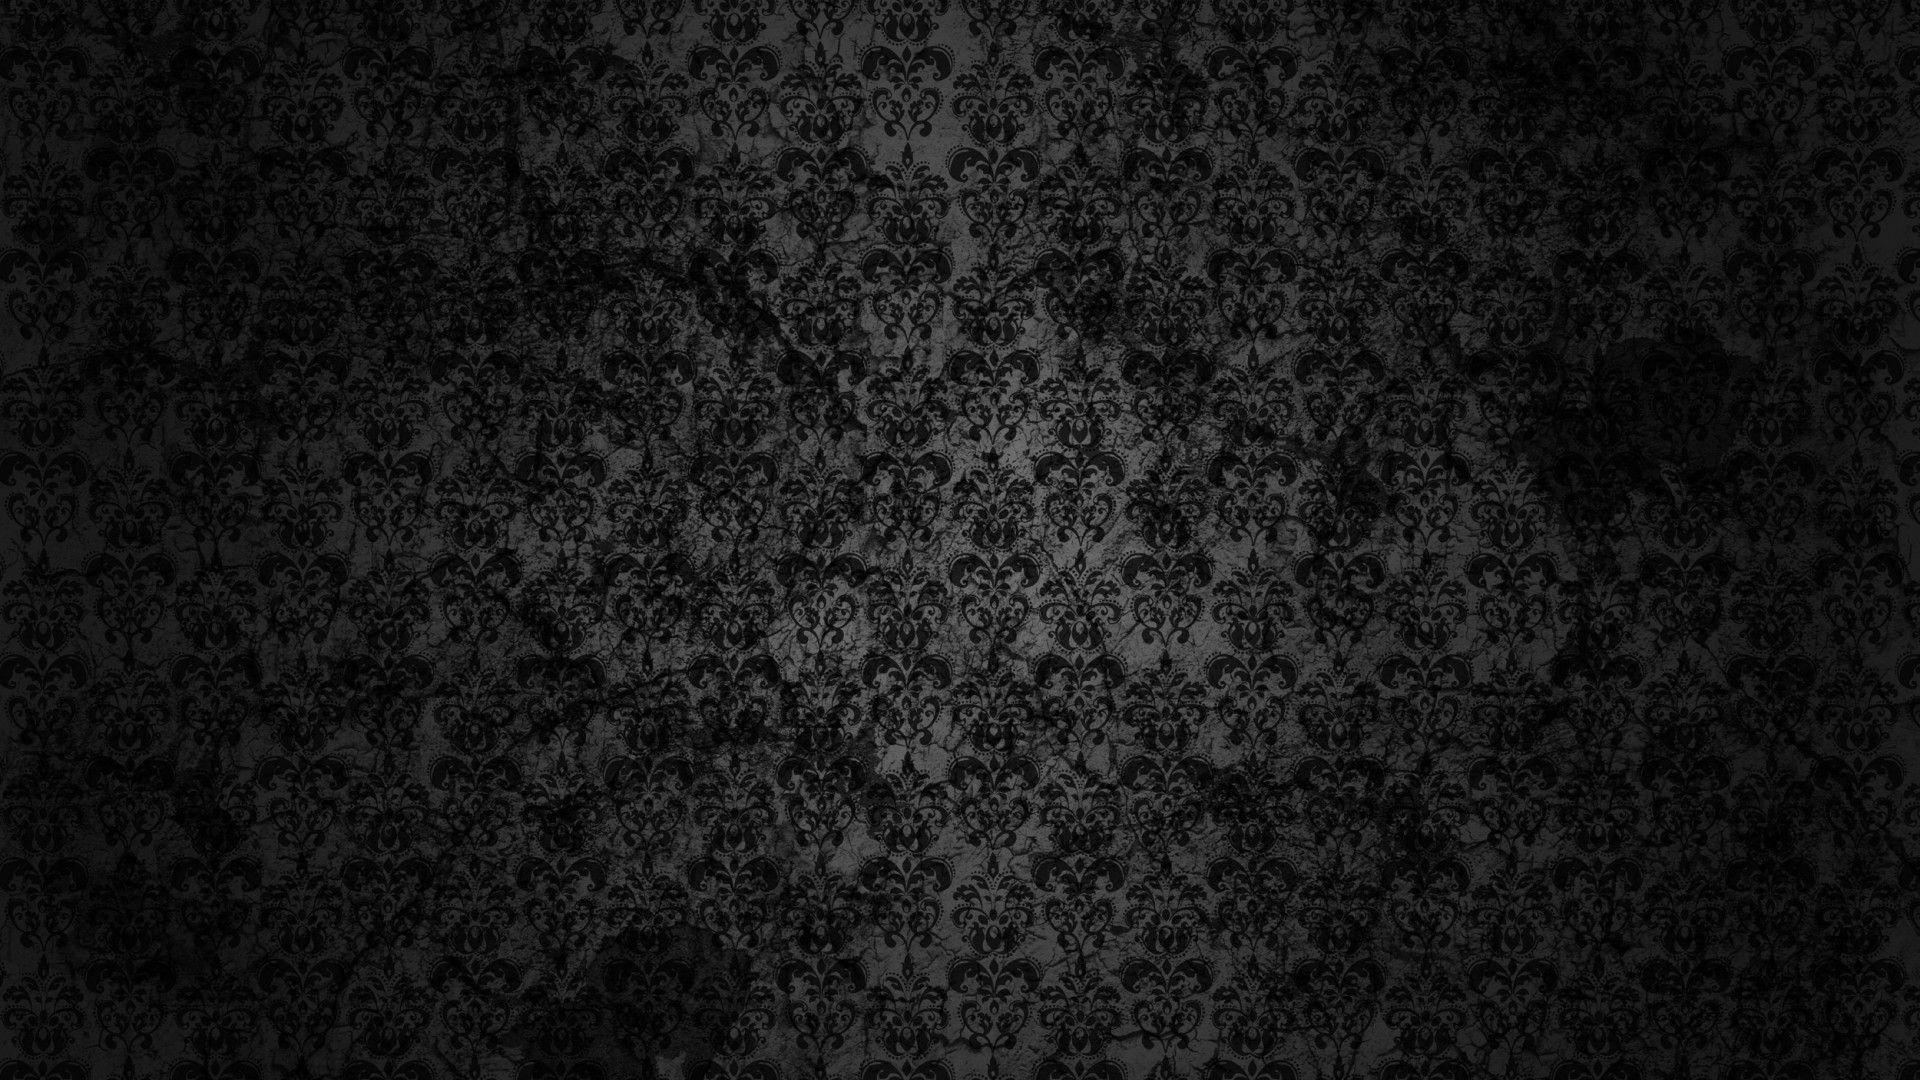 Grunge Desktop Wallpapers Group 1920 1080 Grunge Desktop Wallpapers 27 Wallpapers Black Textured Wallpaper Black Floral Wallpaper Black Texture Background